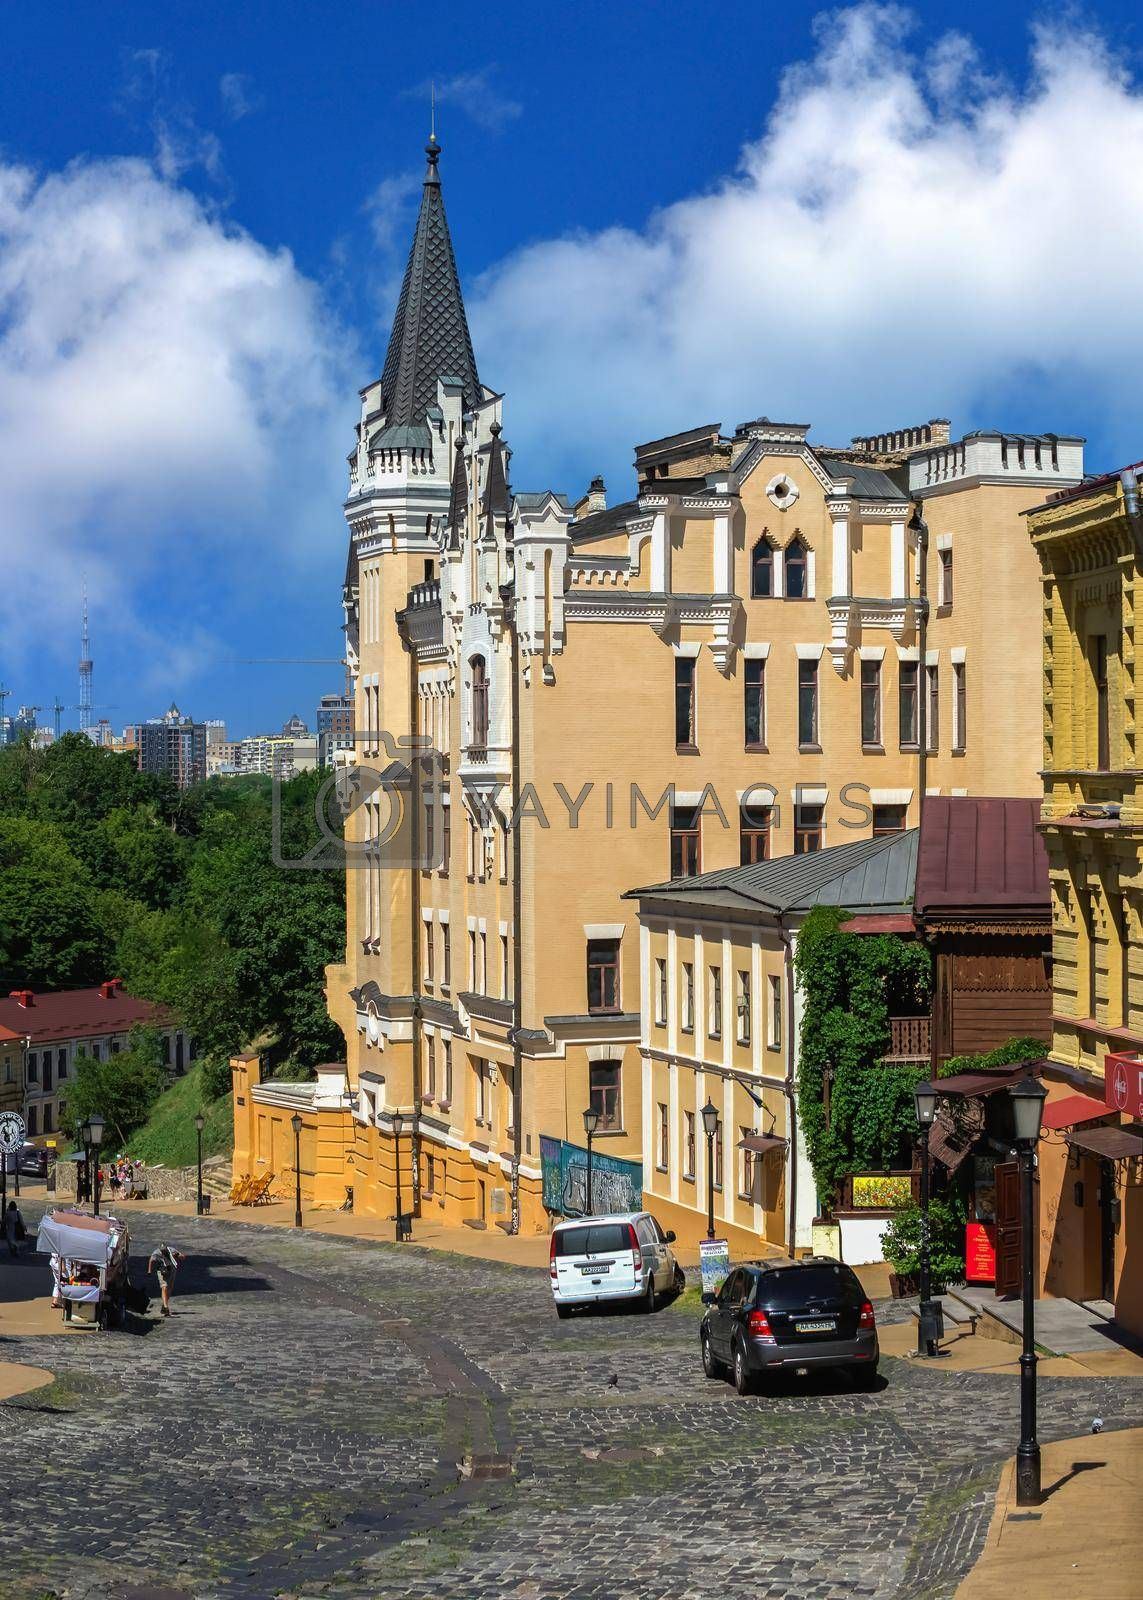 Kyiv, Ukraine 07.11.2020.  Andriyivskyy or Andrew Descent in Kyiv, Ukraine, on a sunny summer day